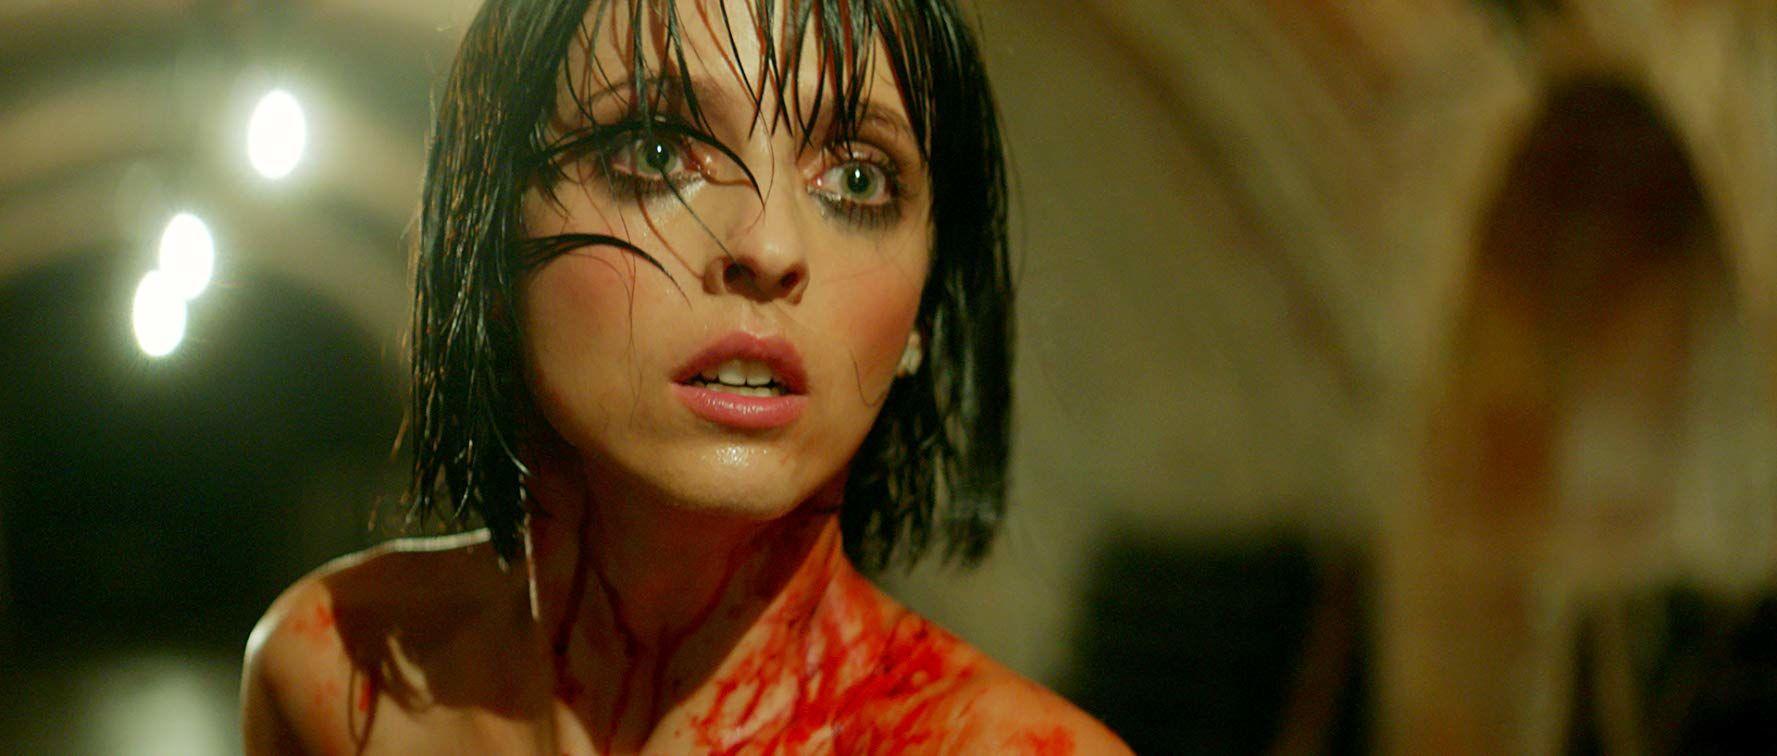 Bukan Cuma Ngeri, 8 Film Zombie Ini Punya Cerita Paling Bagus